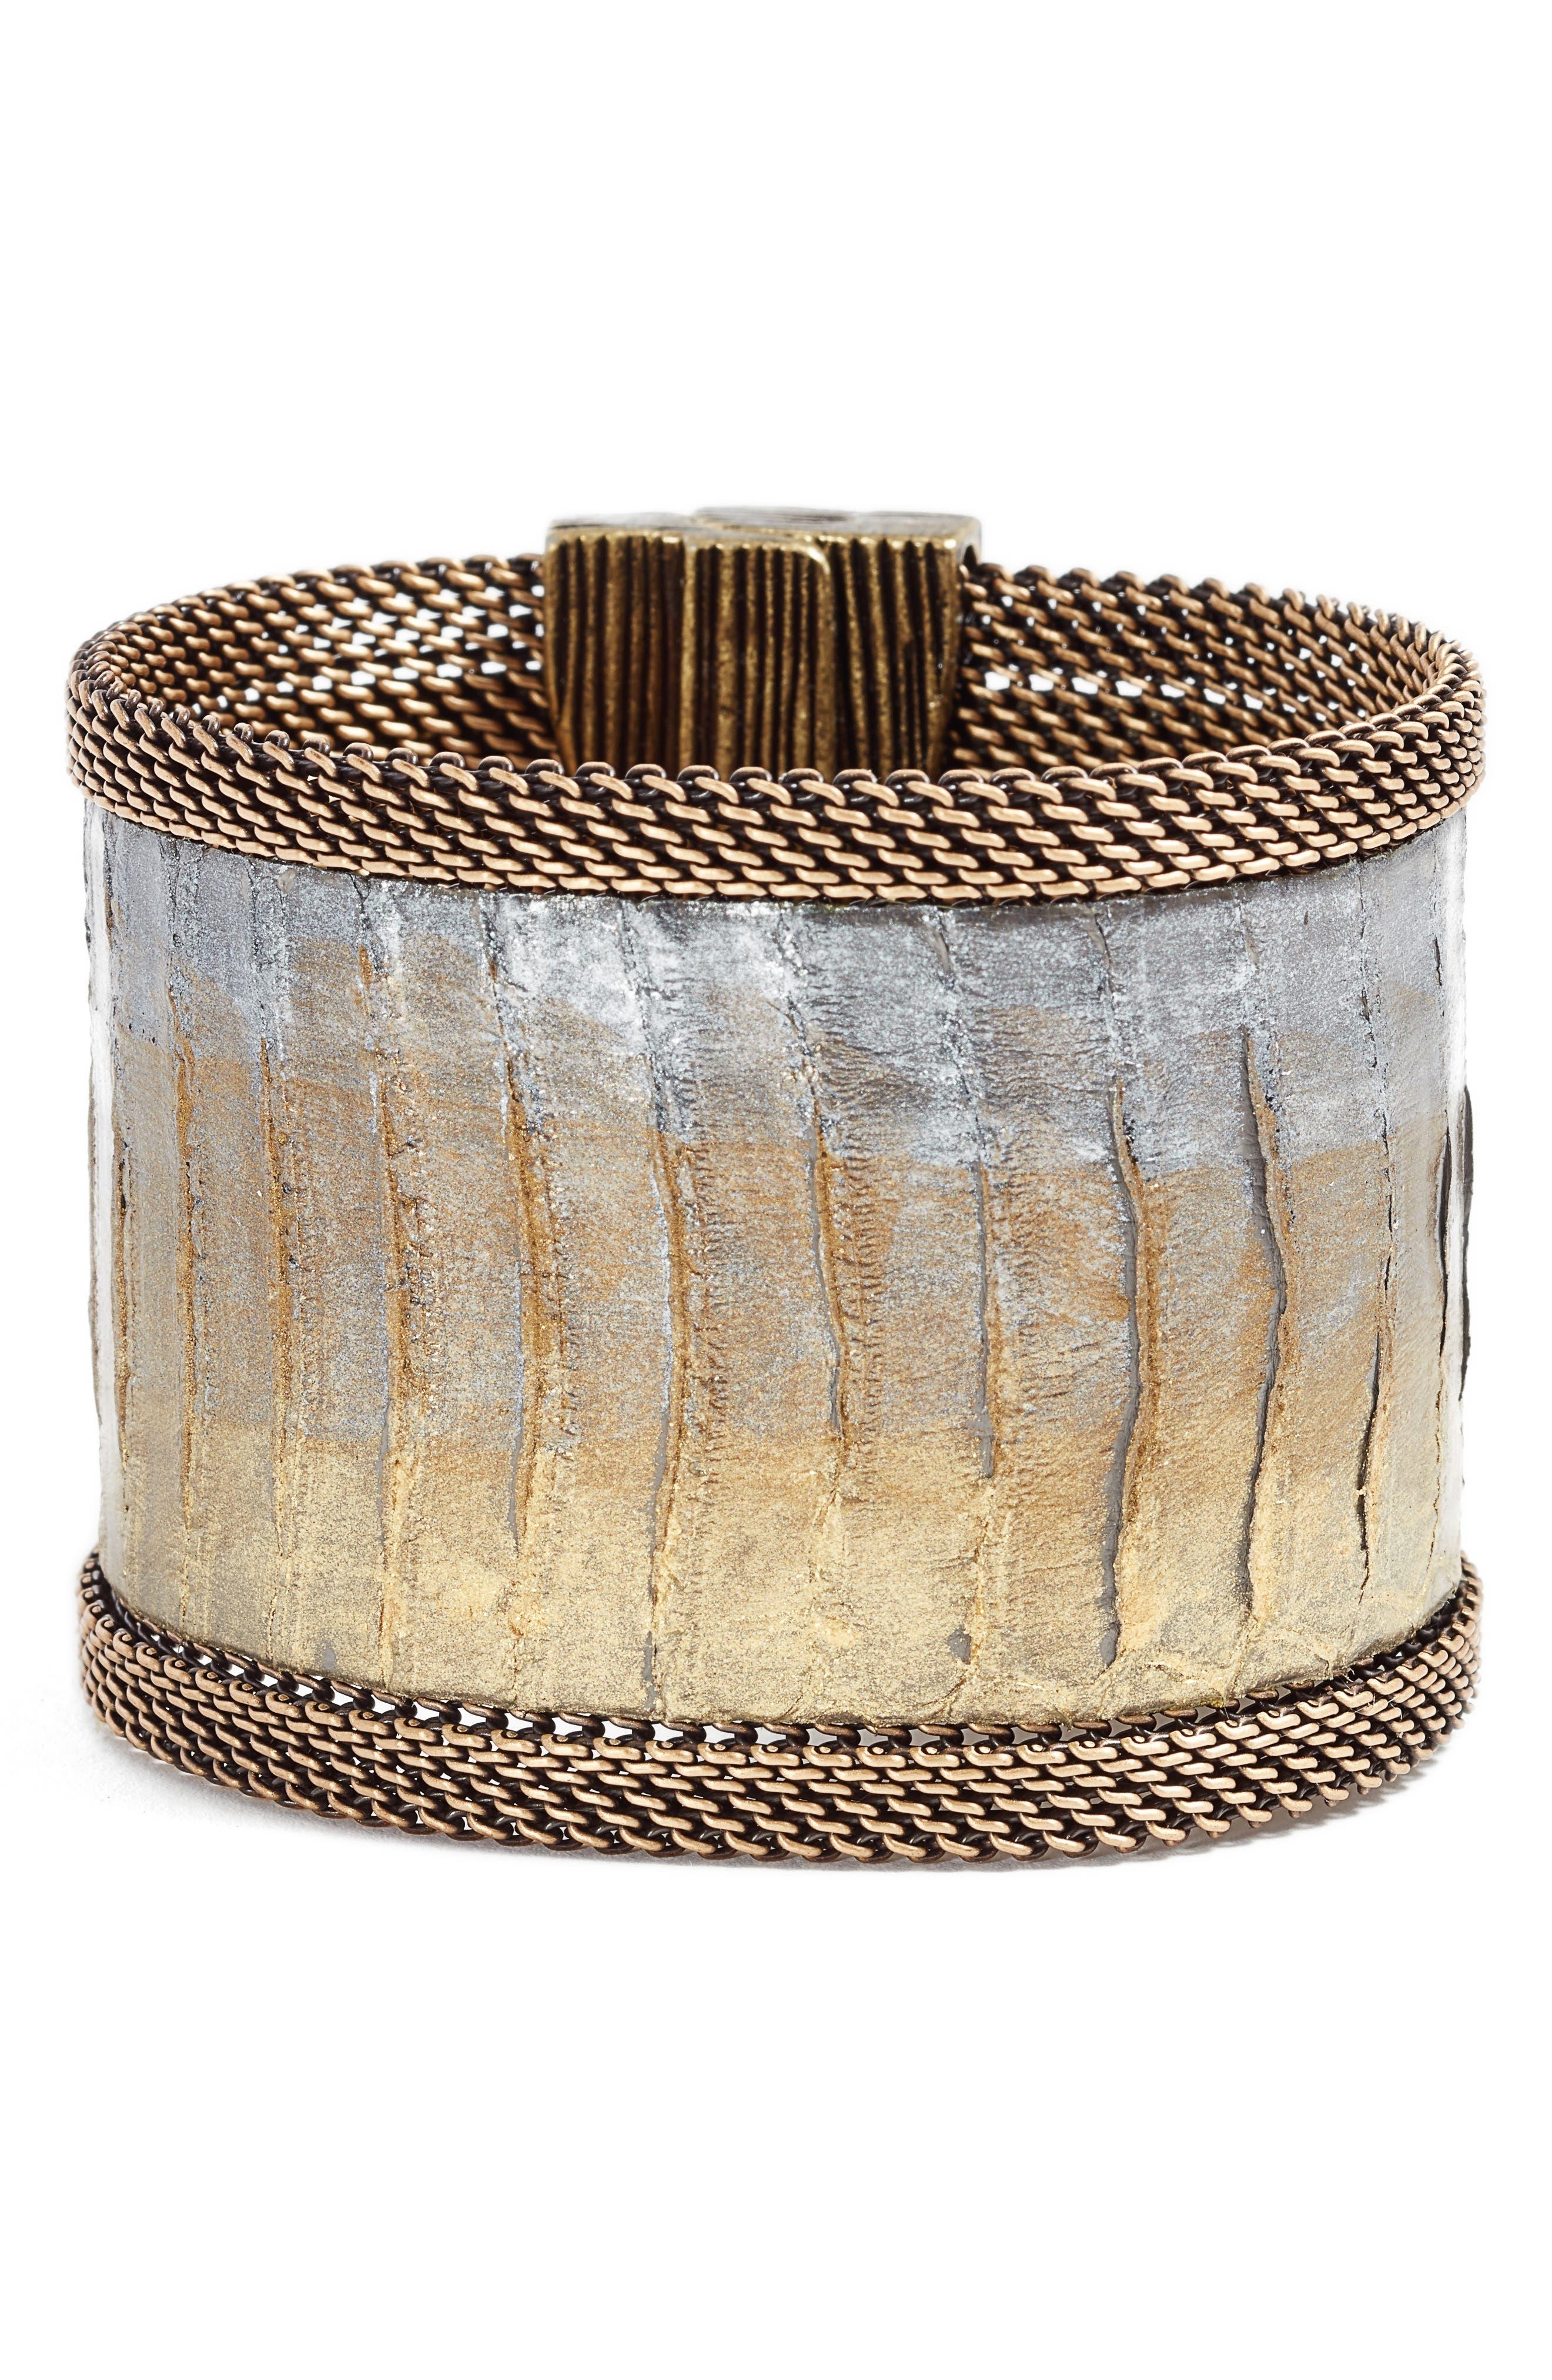 Snakeskin Bracelet,                             Main thumbnail 1, color,                             Gold/ Grey/ Bronze